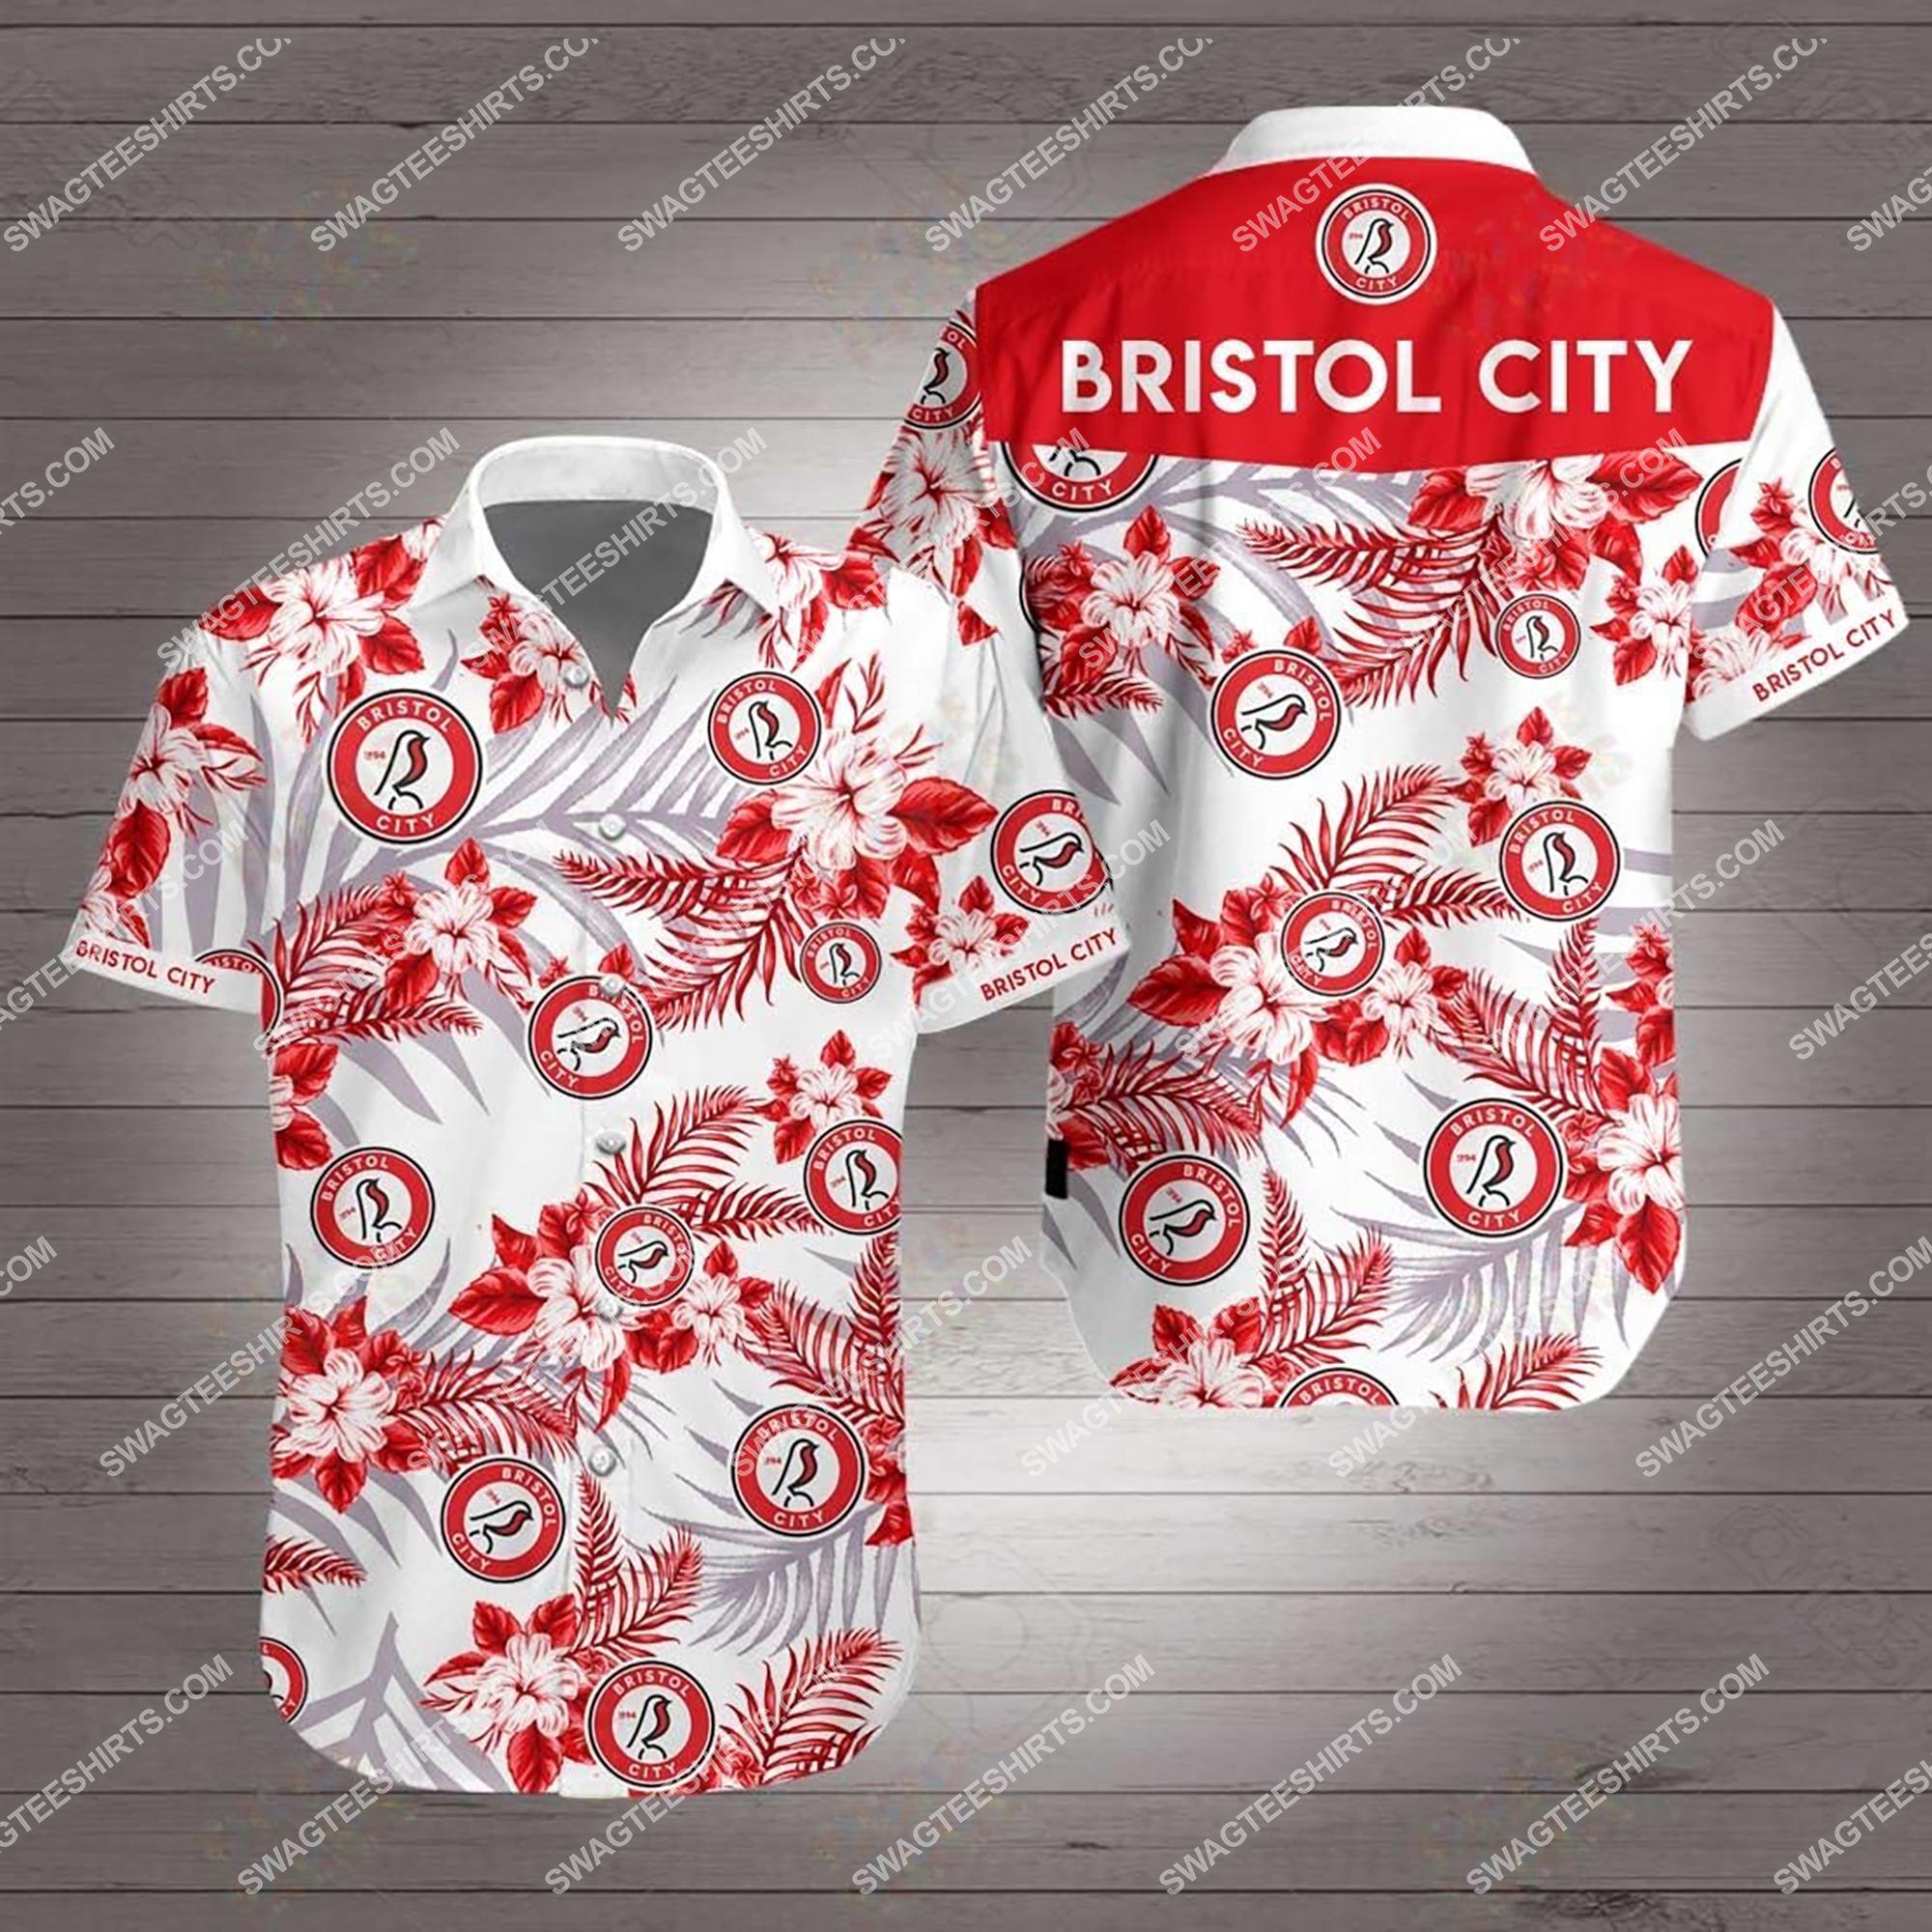 the bristol city fc full printing summer hawaiian shirt 2 - Copy (3)